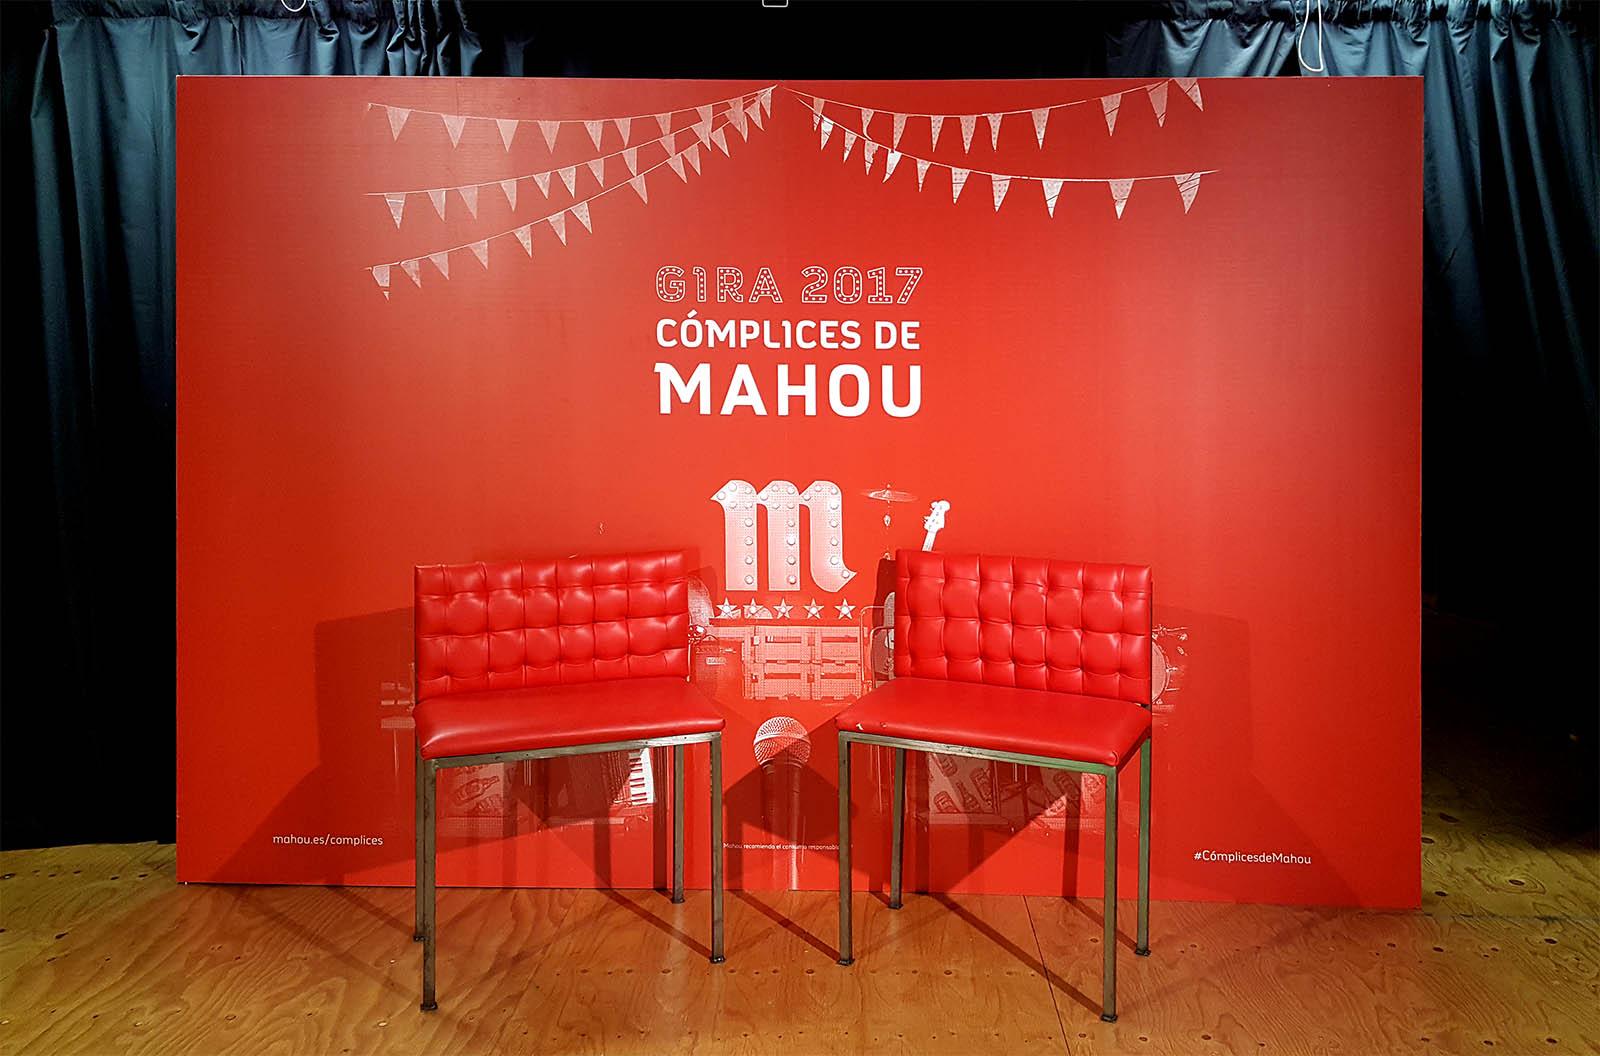 clientes-complices-mahou10